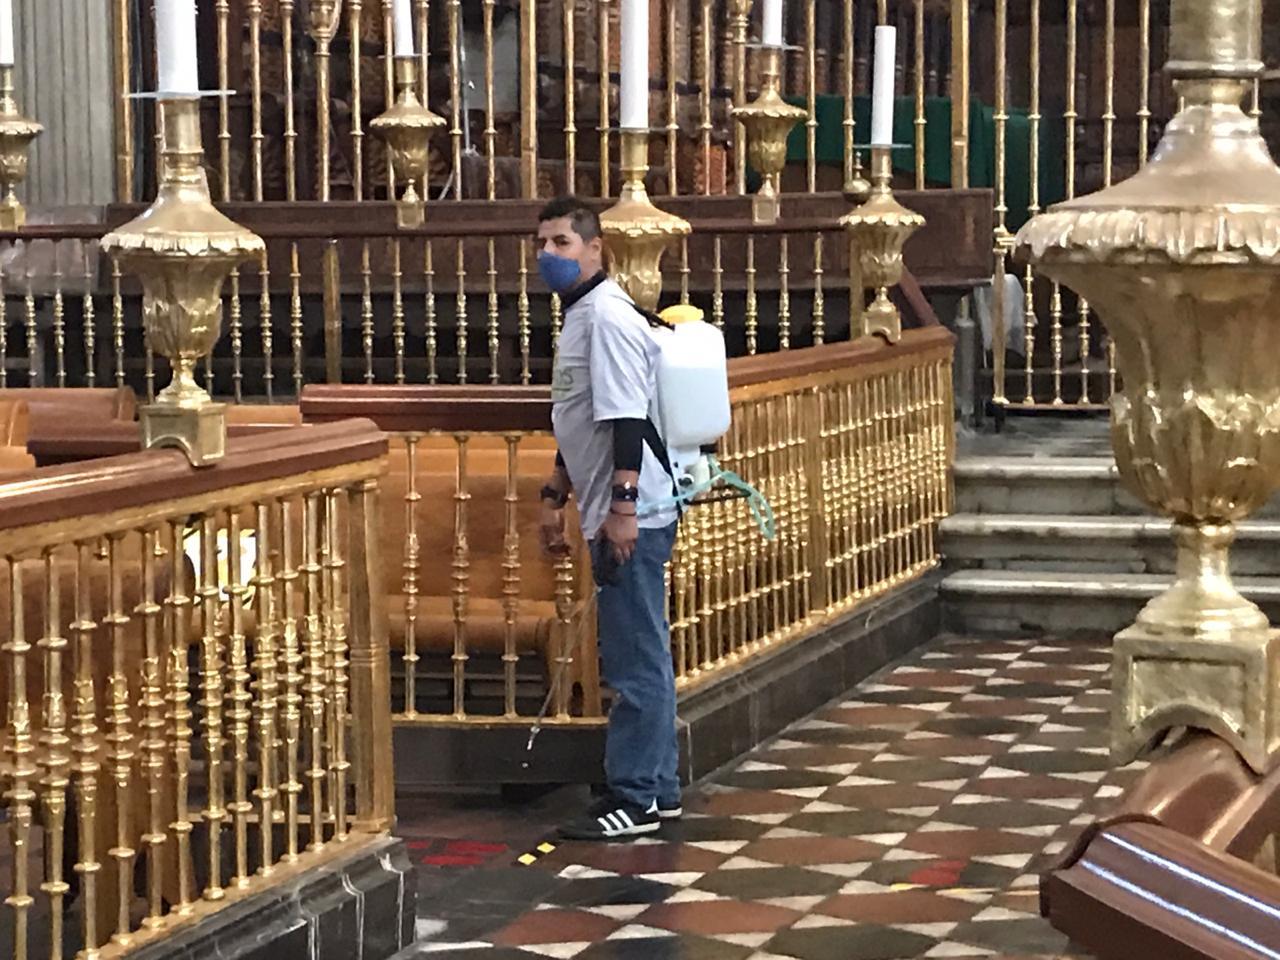 Video desde Puebla: Feligreses regresan a la Catedral de la Angelópolis a escuchar misa